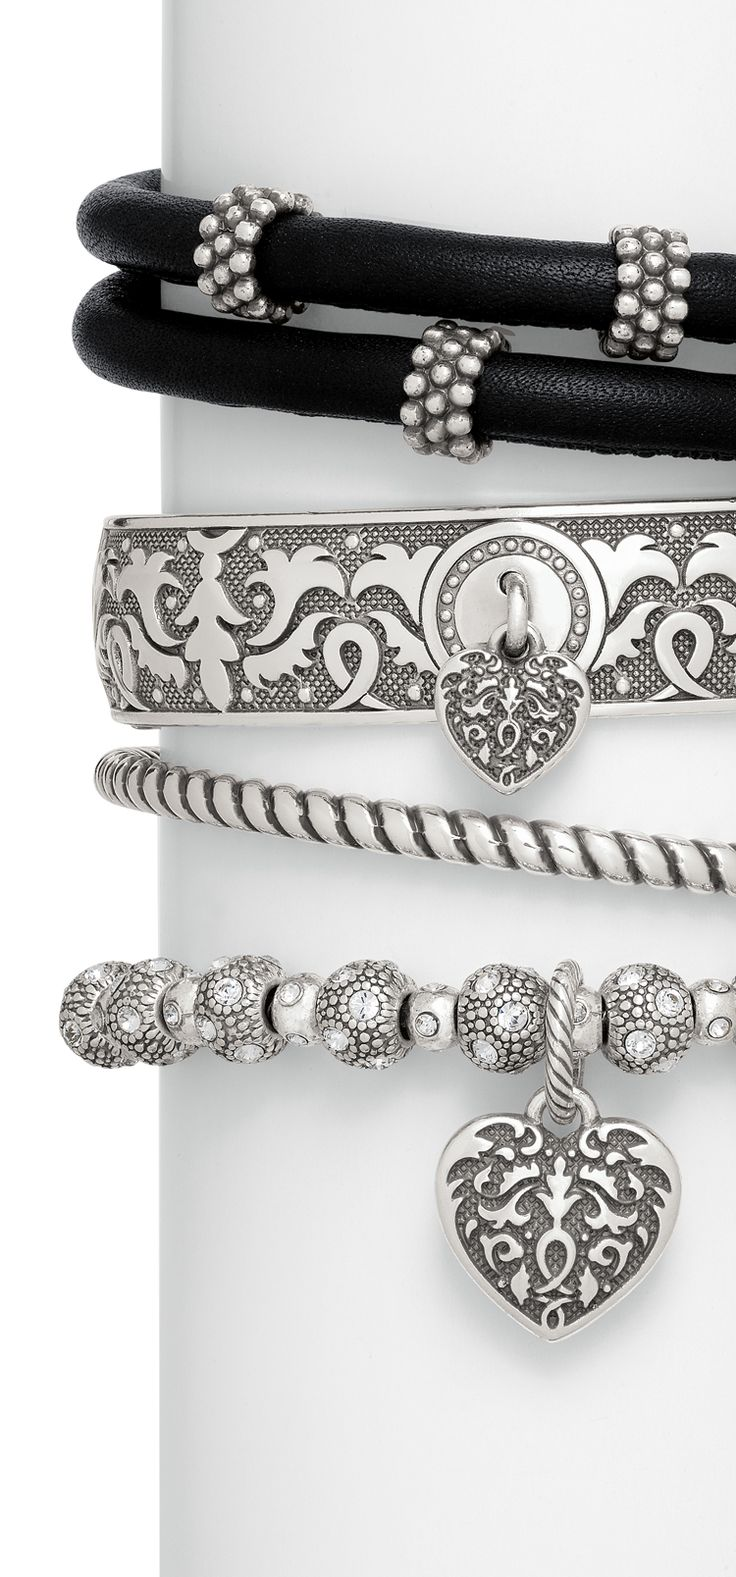 Brighton dark romance charm bracelets with Cordoba heart charms